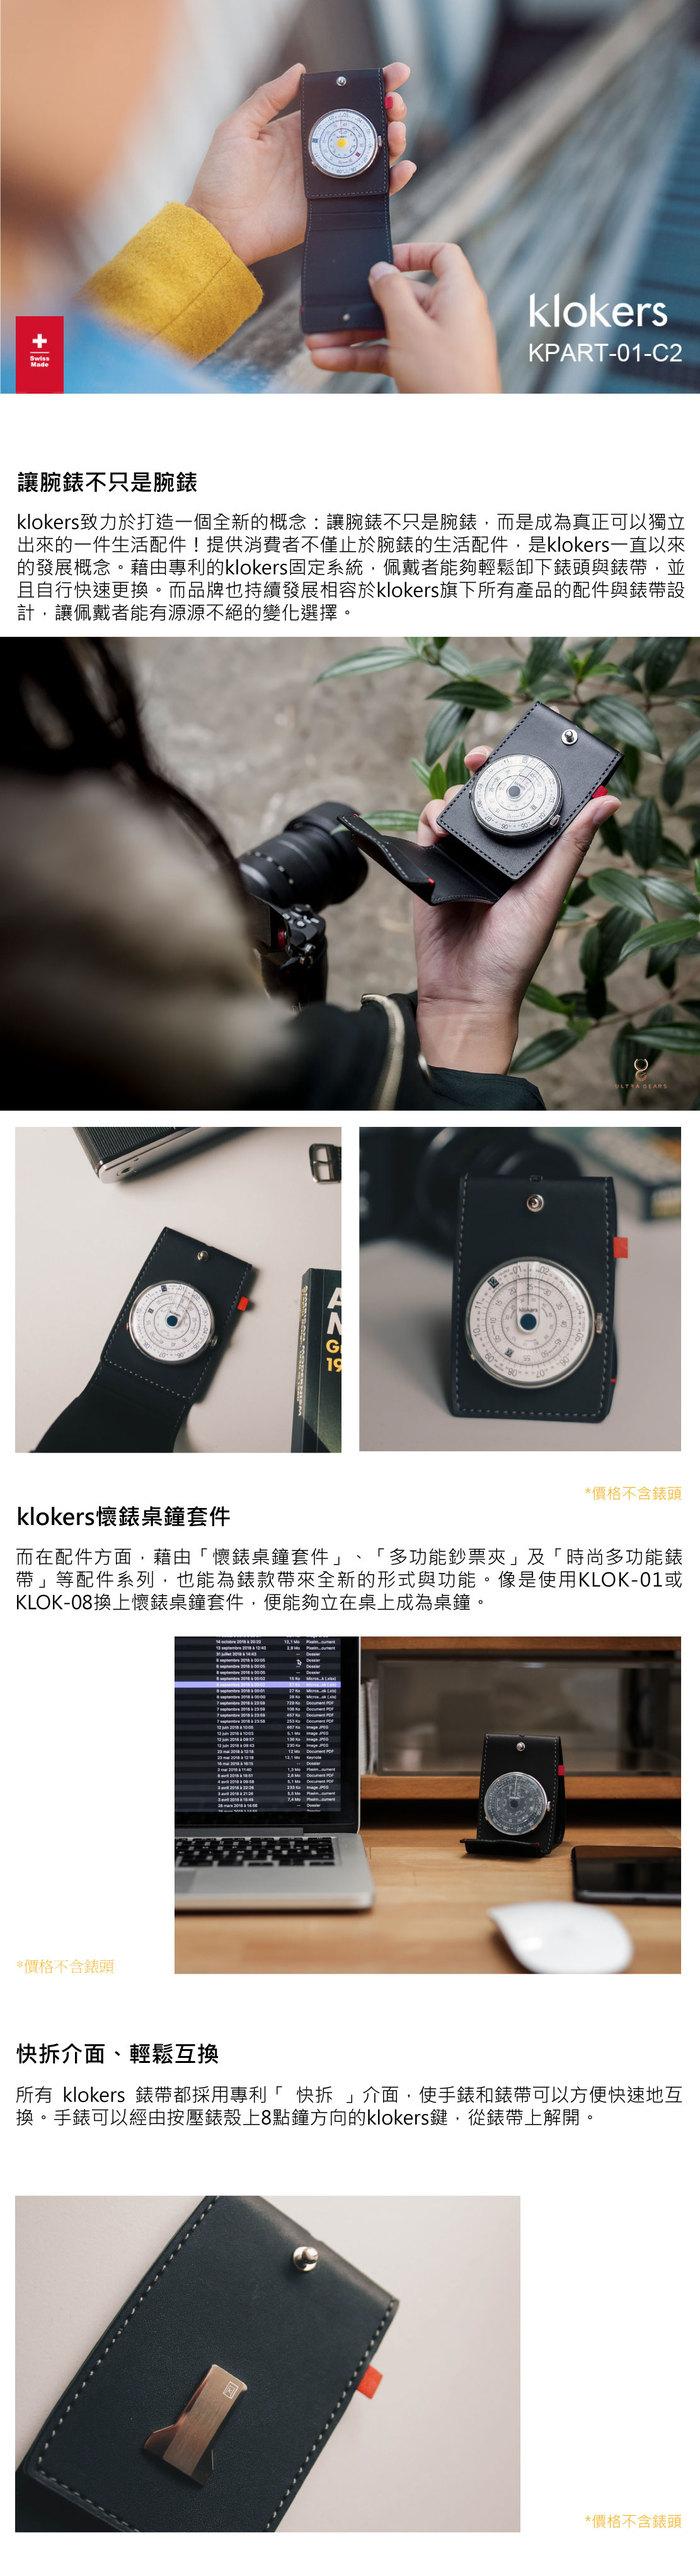 klokers    KPART-01-C2 懷錶桌鐘套件